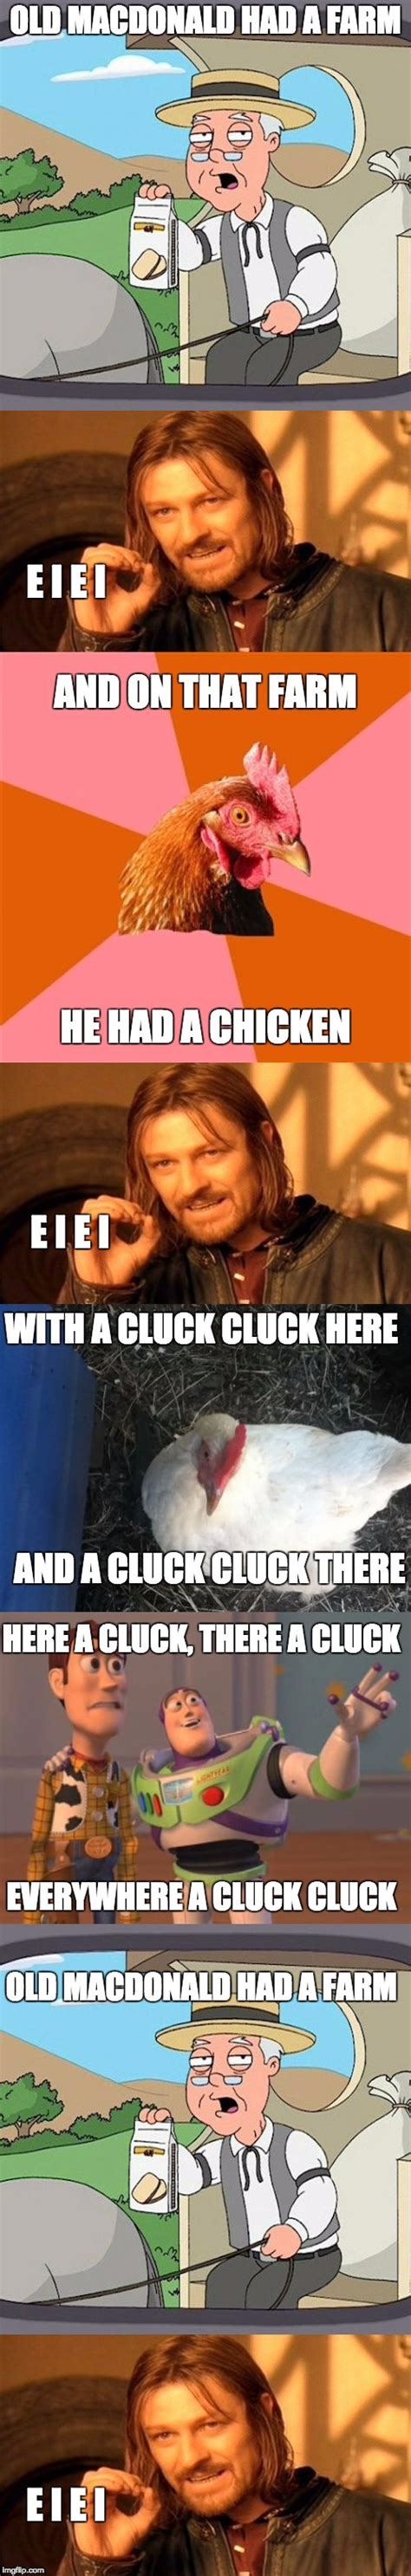 Old Macdonald Had A Farm Meme - old macdonald had a farm meme driverlayer search engine